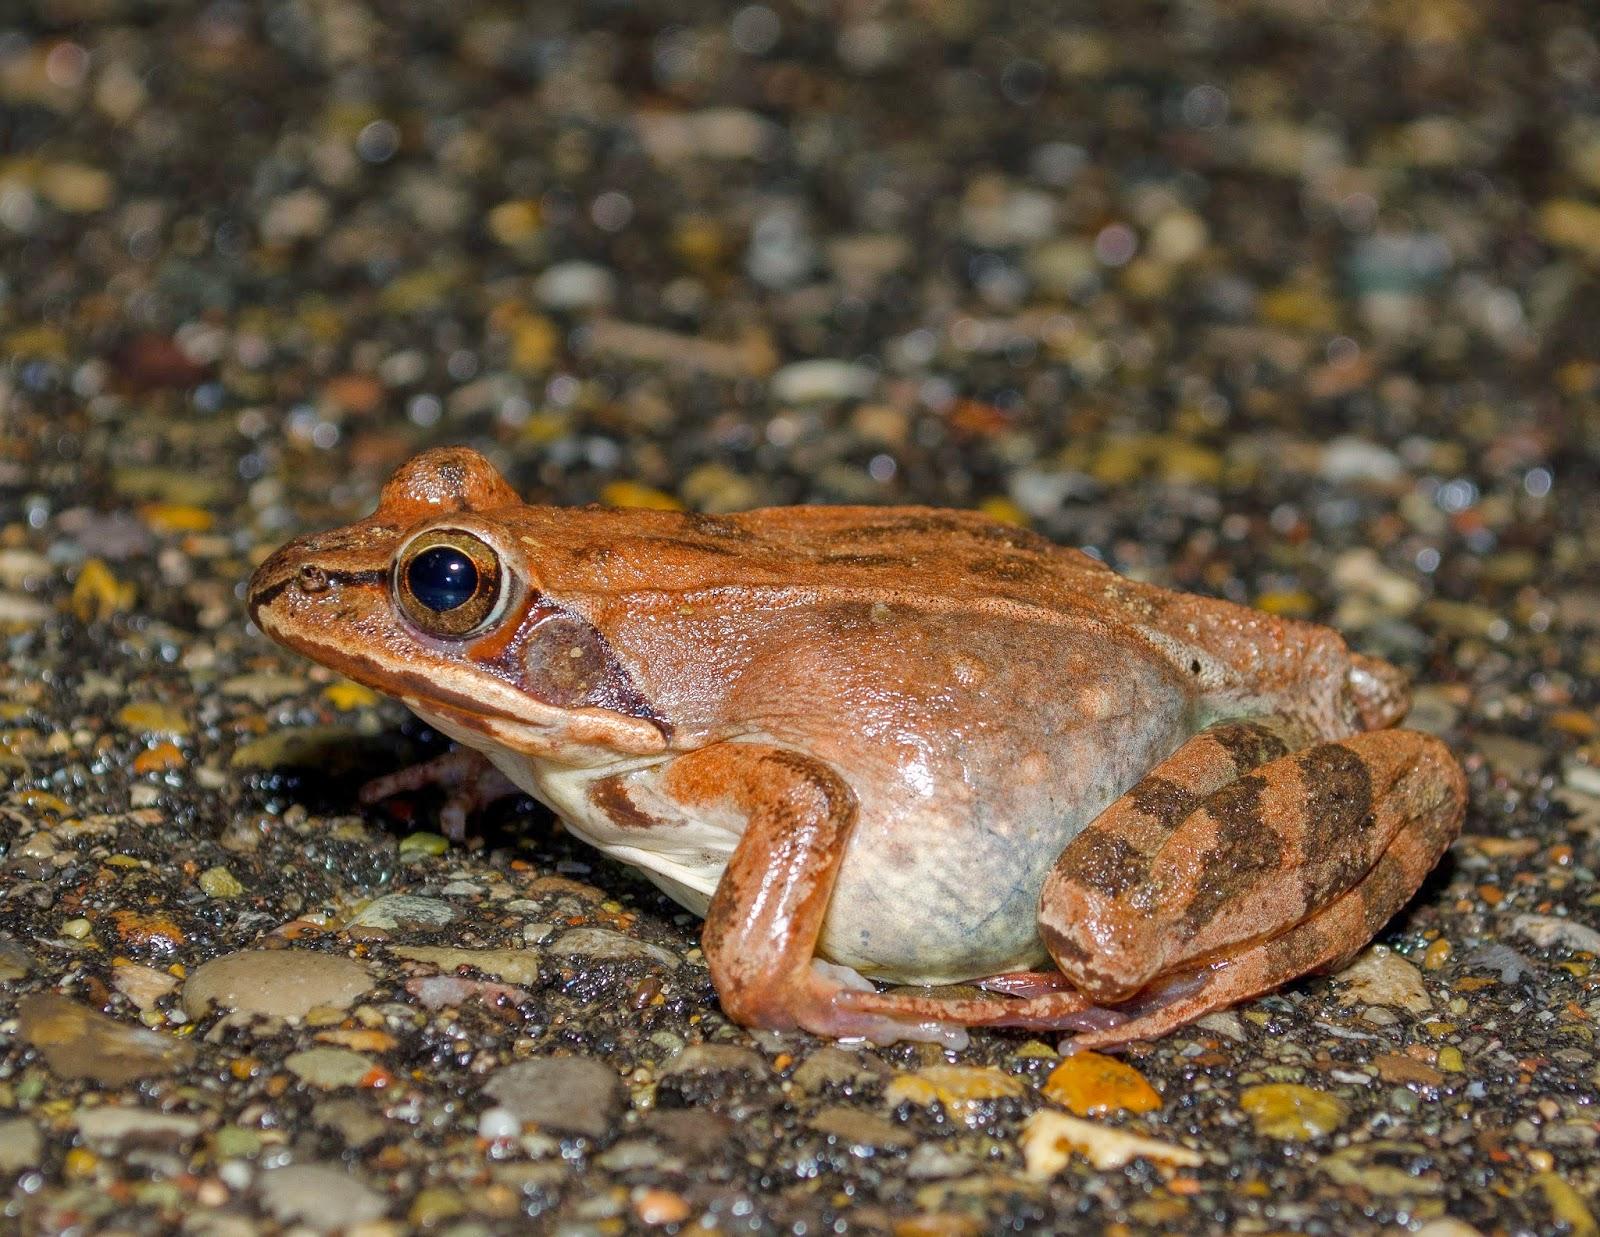 Wood Frog, Lithobates sylvaticus